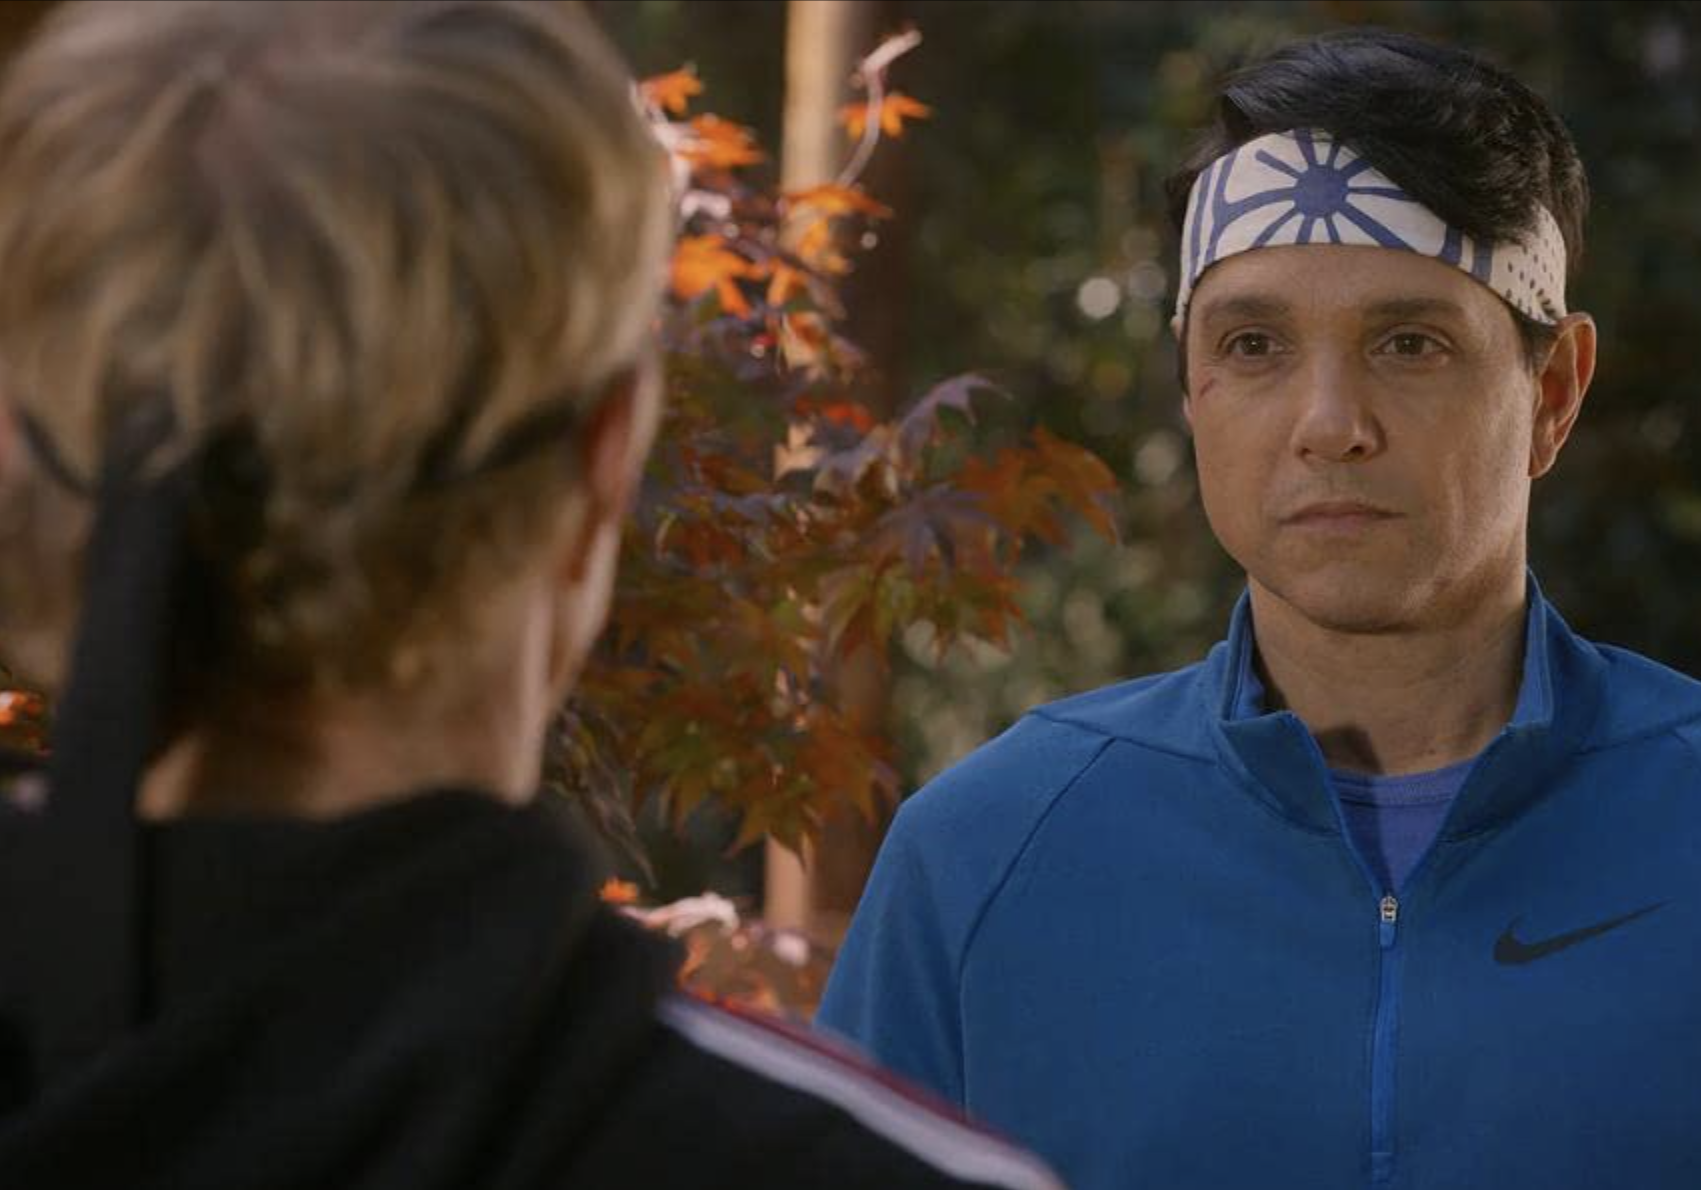 Screenshot 2021 04 26 at 08.52.47 e1619423676914 Cobra Kai Proves Daniel Was The Real Villain Of Karate Kid All Along